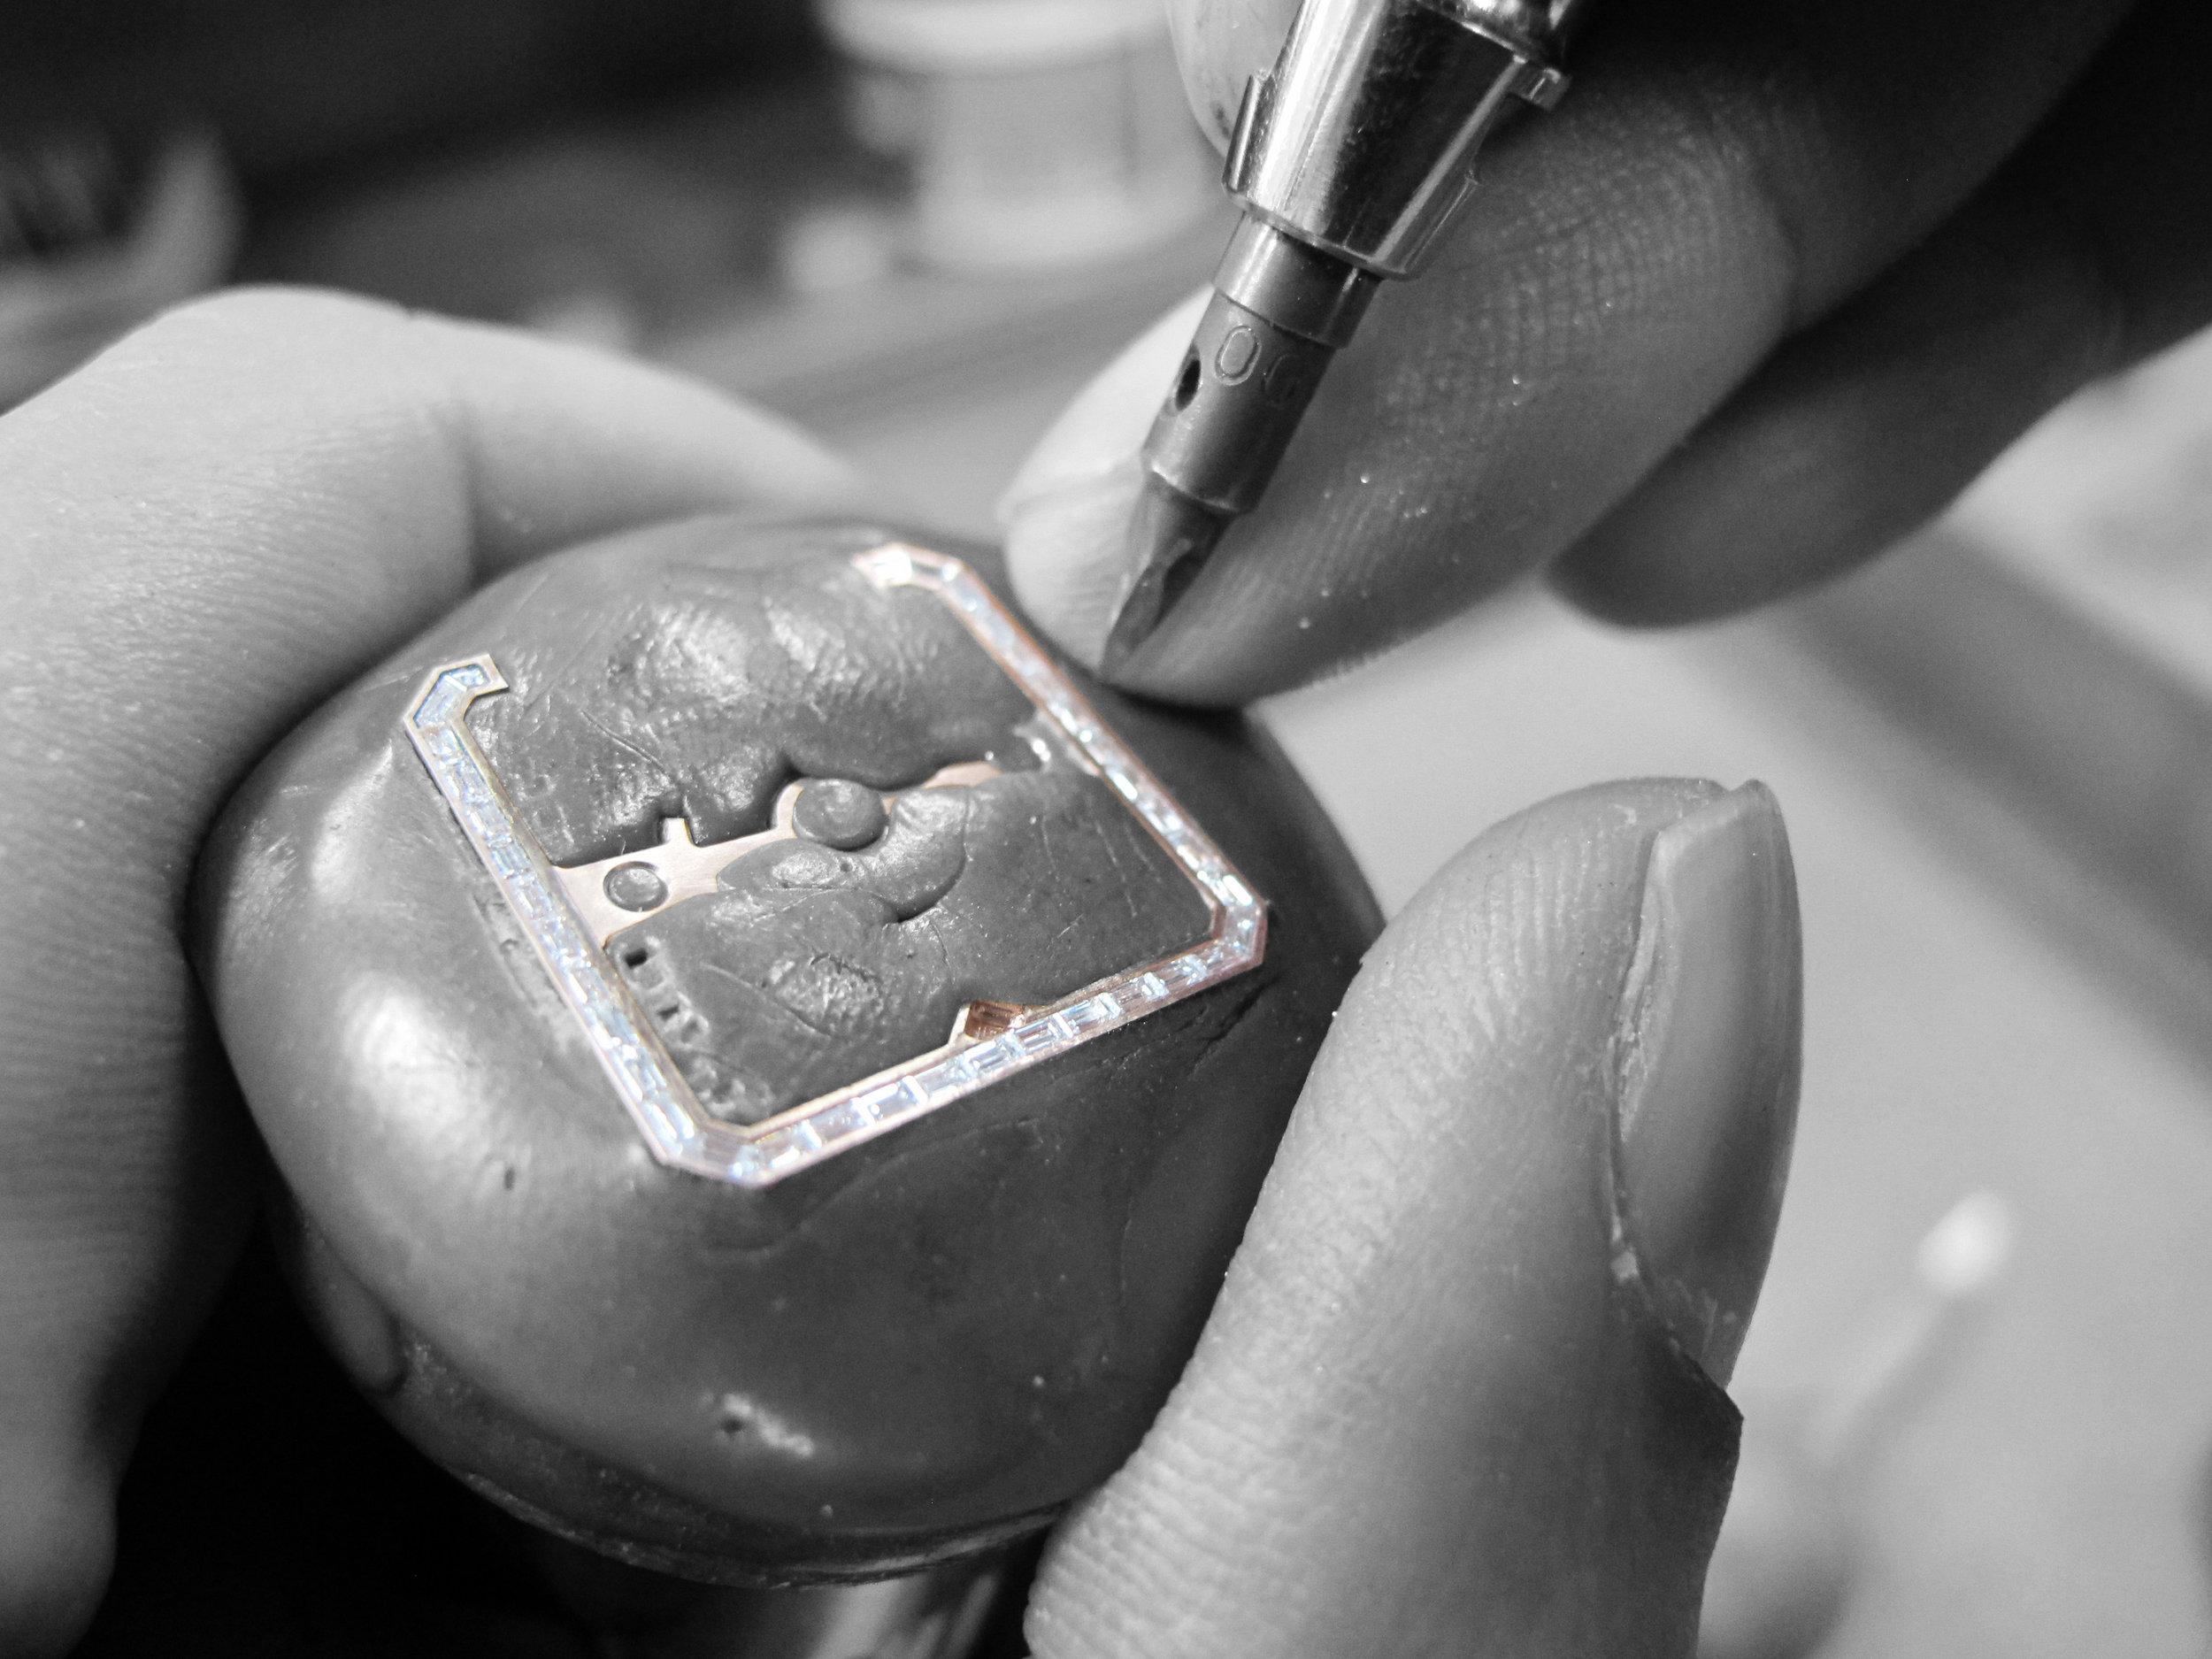 backes & strauss craftsmanship